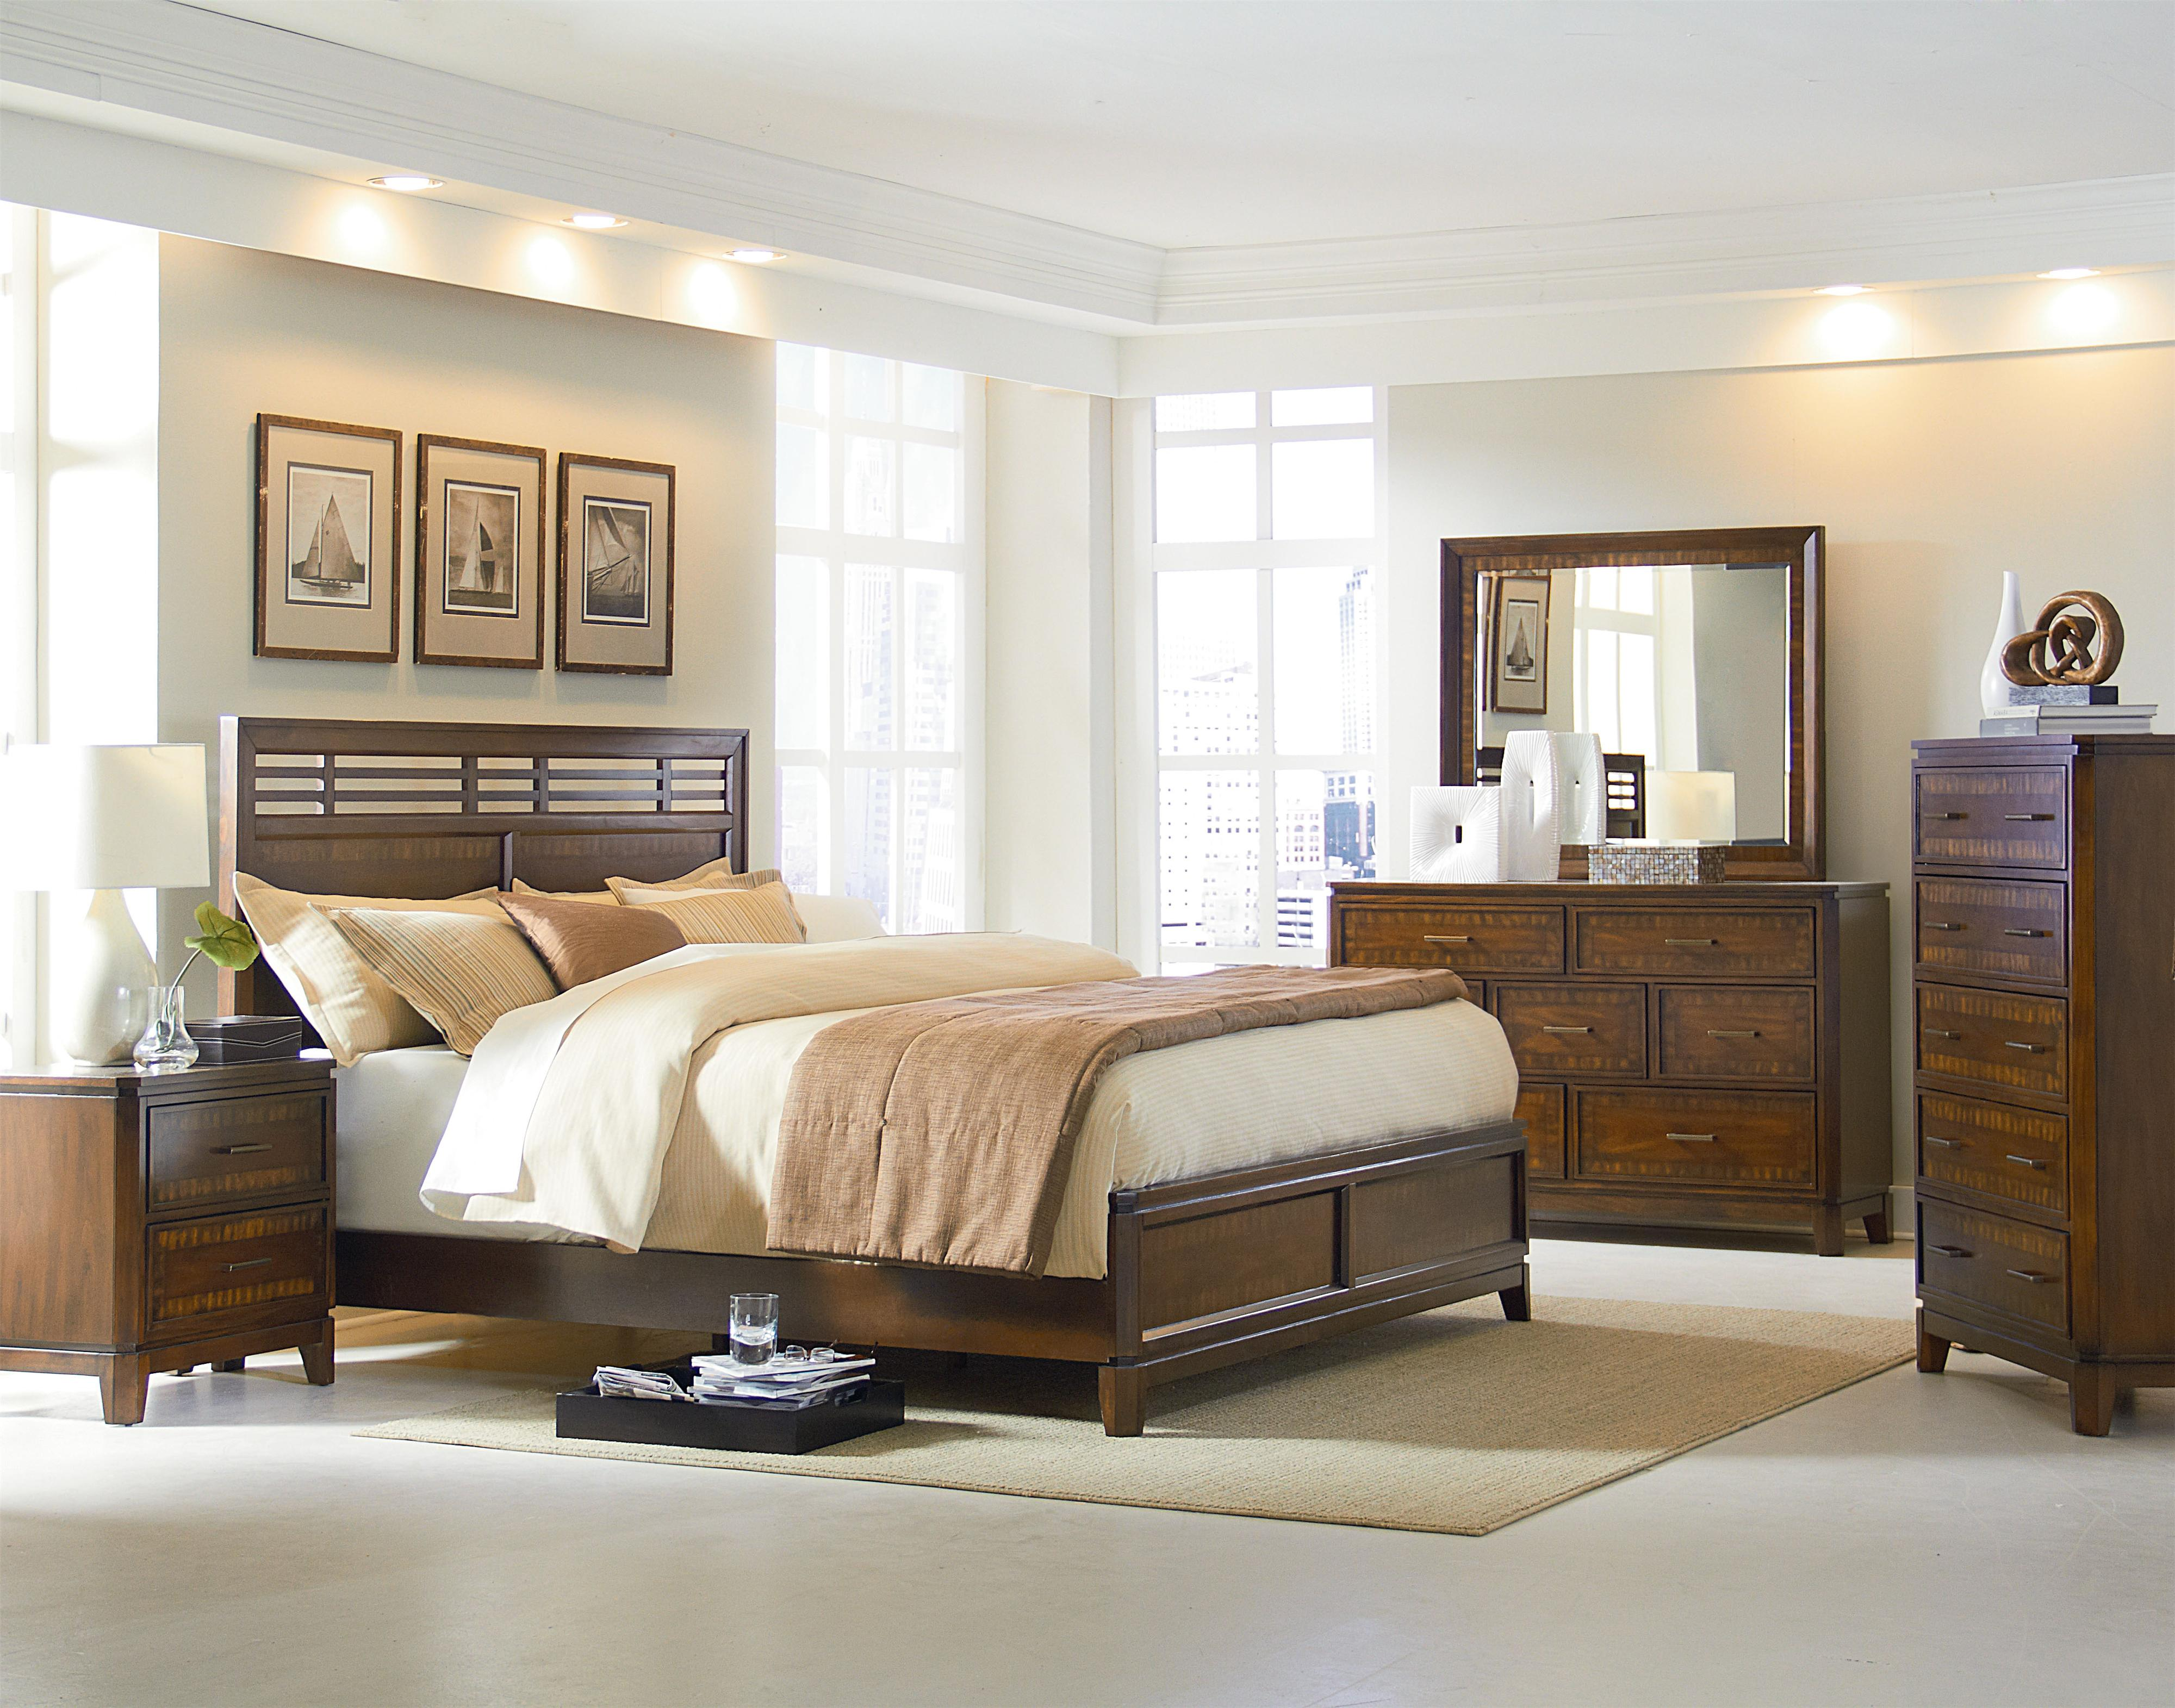 Standard Furniture Avion  Queen Bedroom Group - Item Number: 86450 Q Bedroom Group